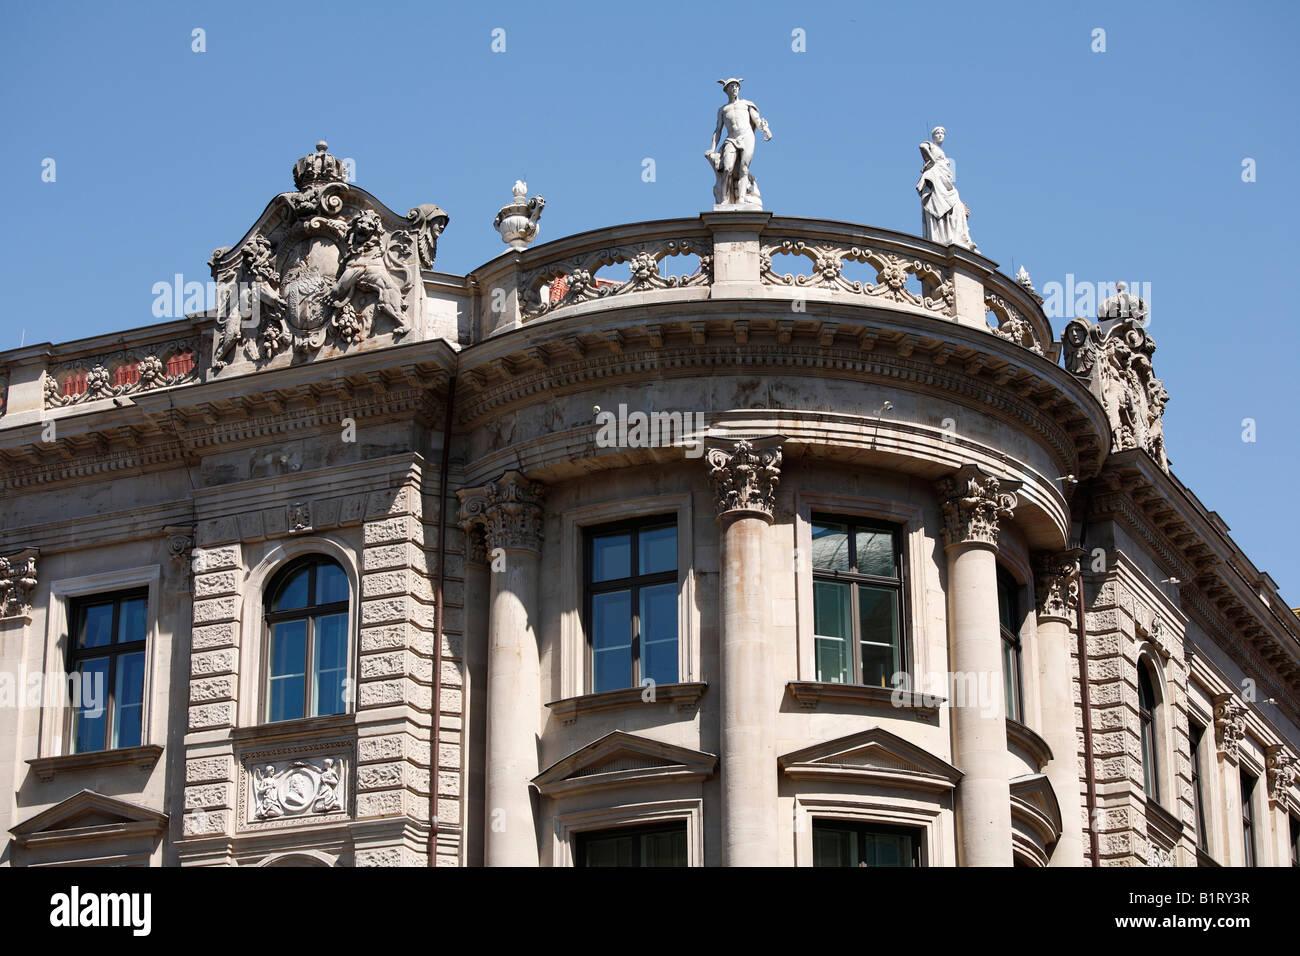 Former Koeniglich Bayerische Bank and Bayerische Staatsbank, former royal bavarian bank and state bank, Kardinal - Stock Image